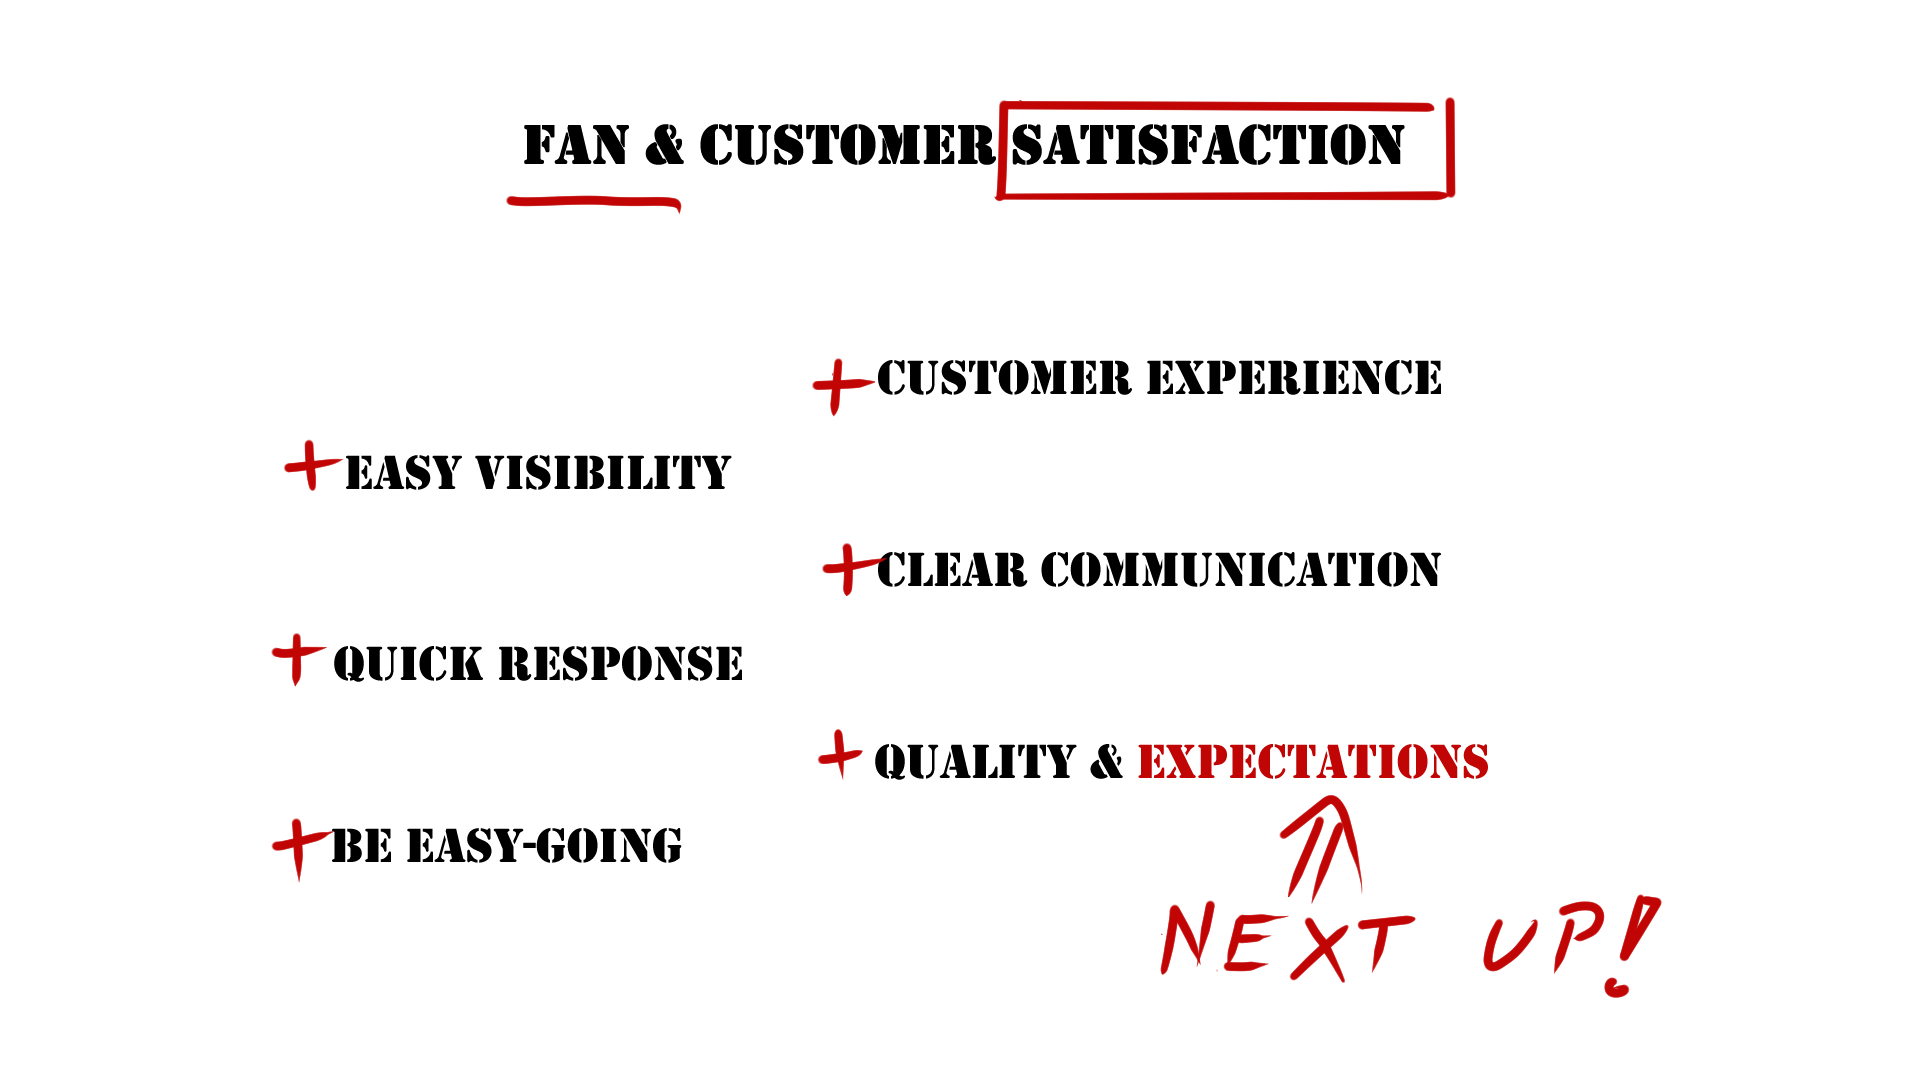 Dance Marketing Customer Satisfaction Overview